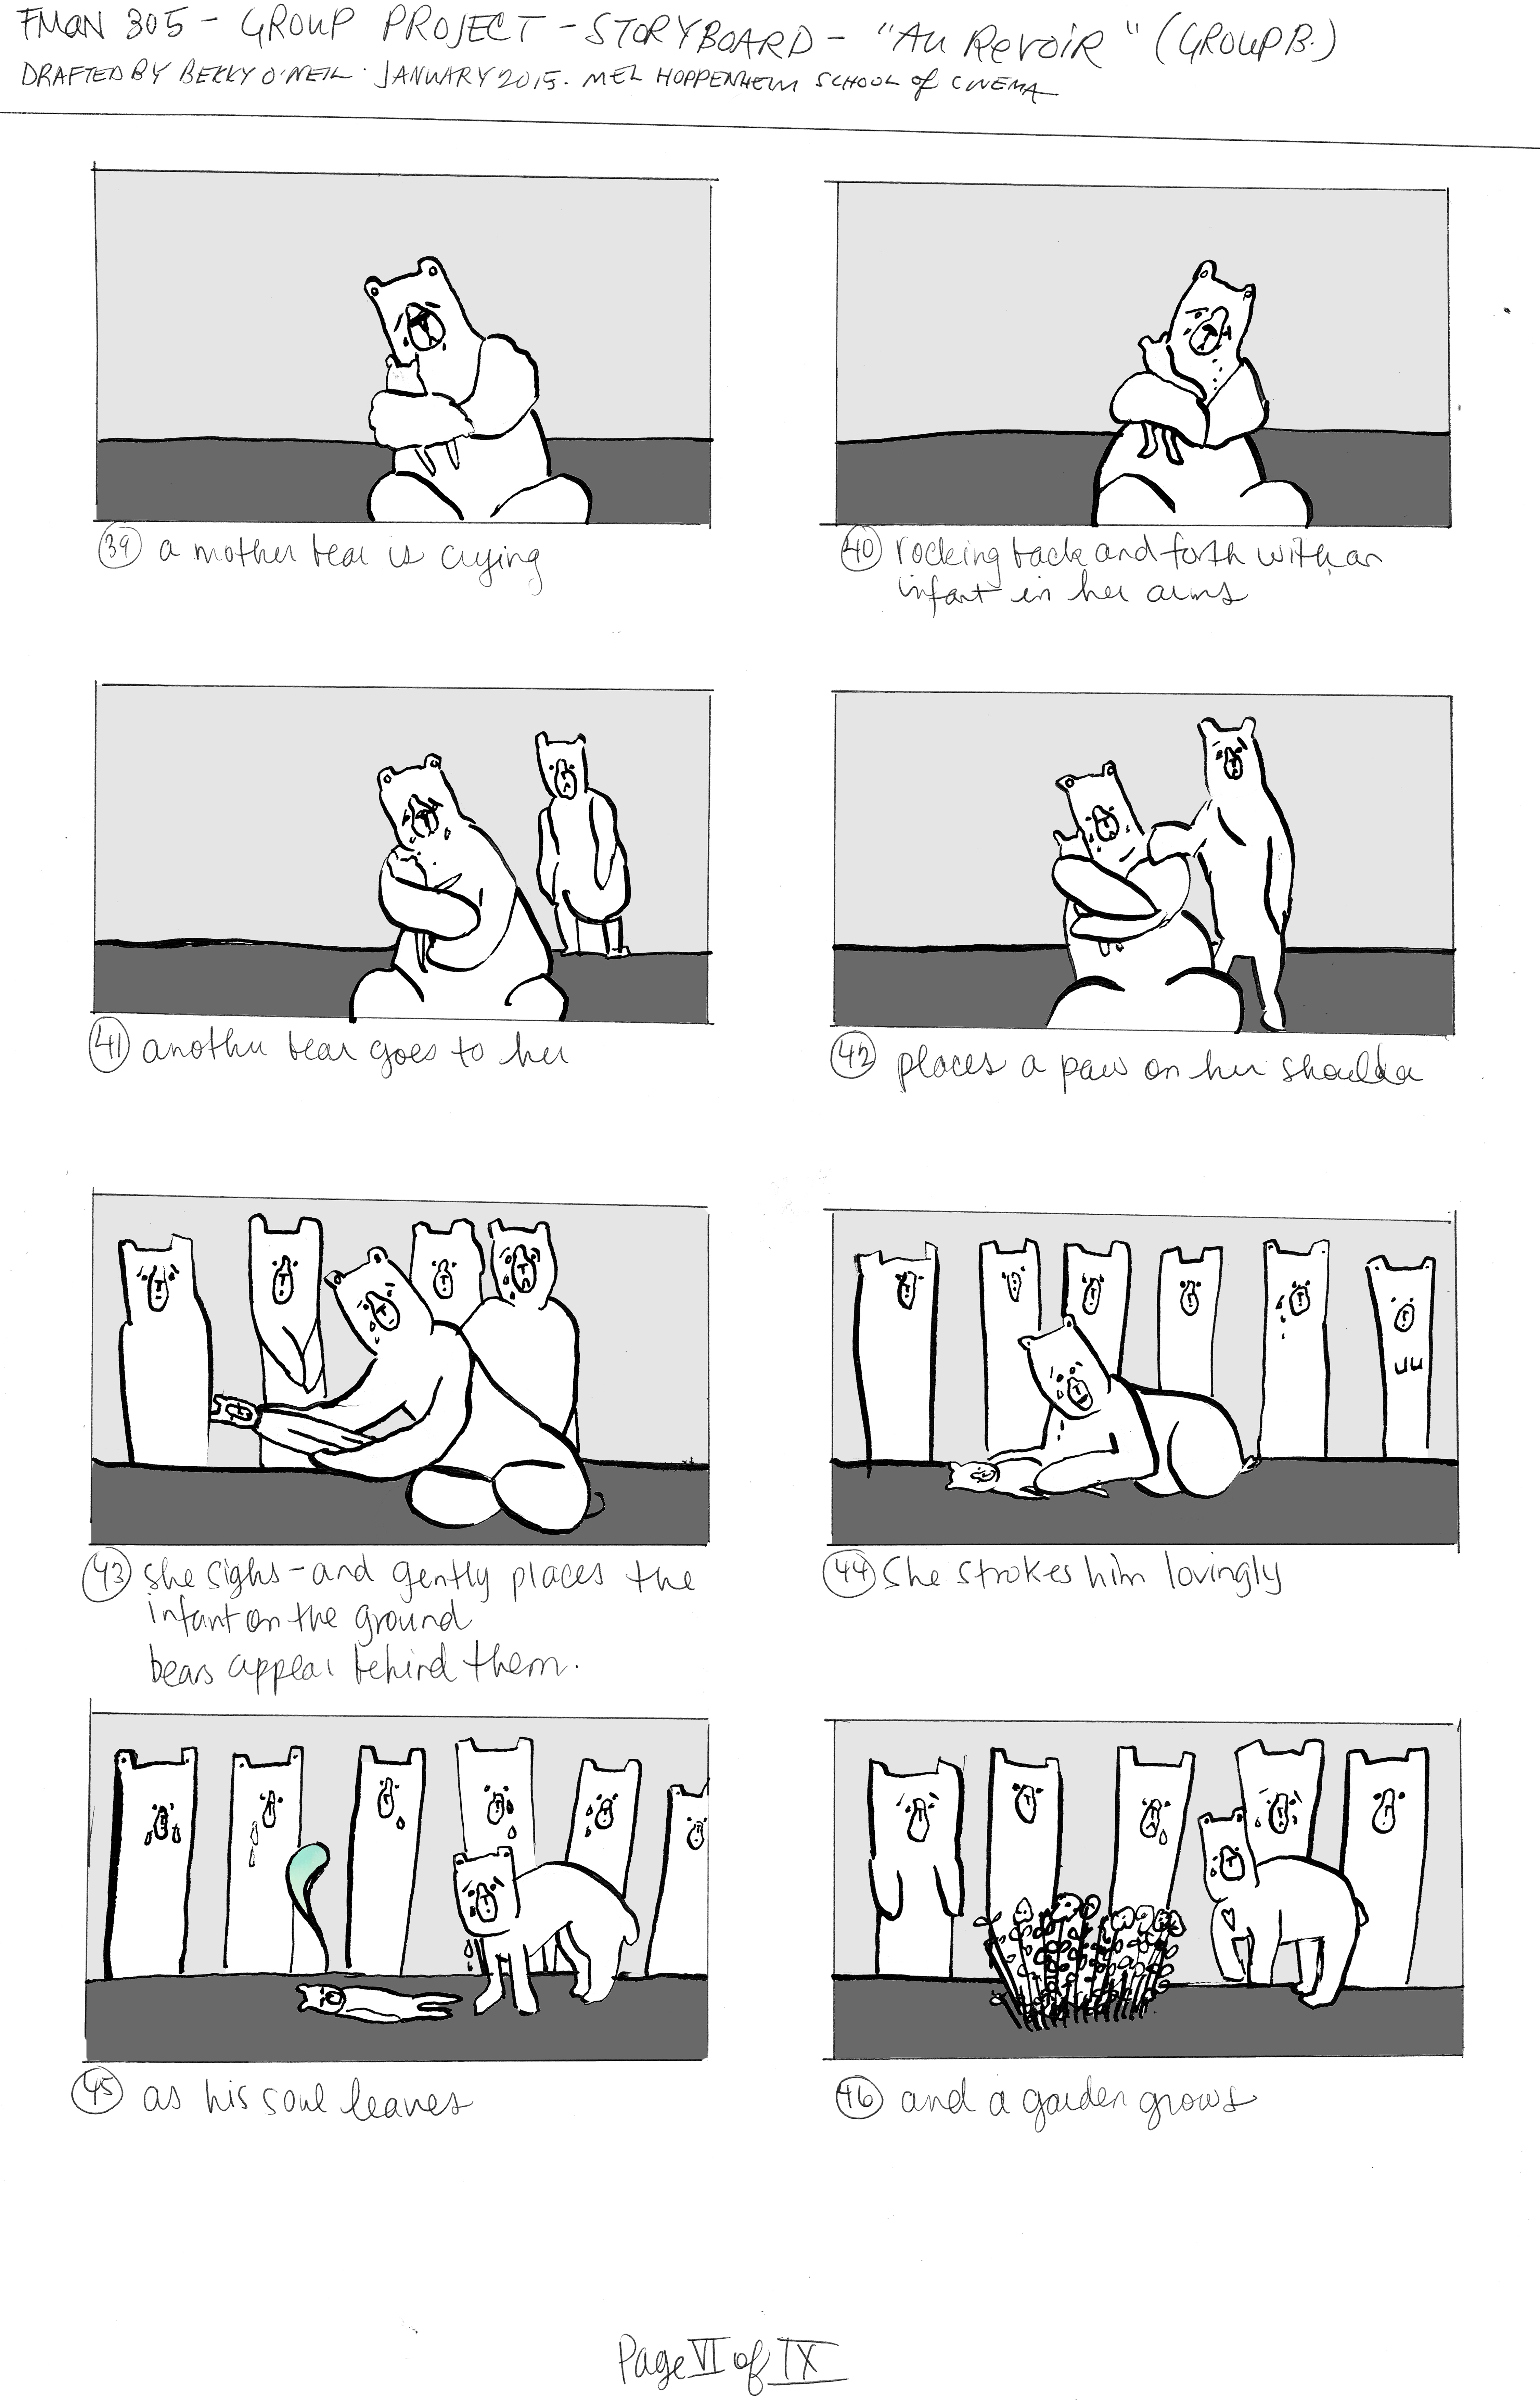 AuRevoir-Storyboard-6.jpg